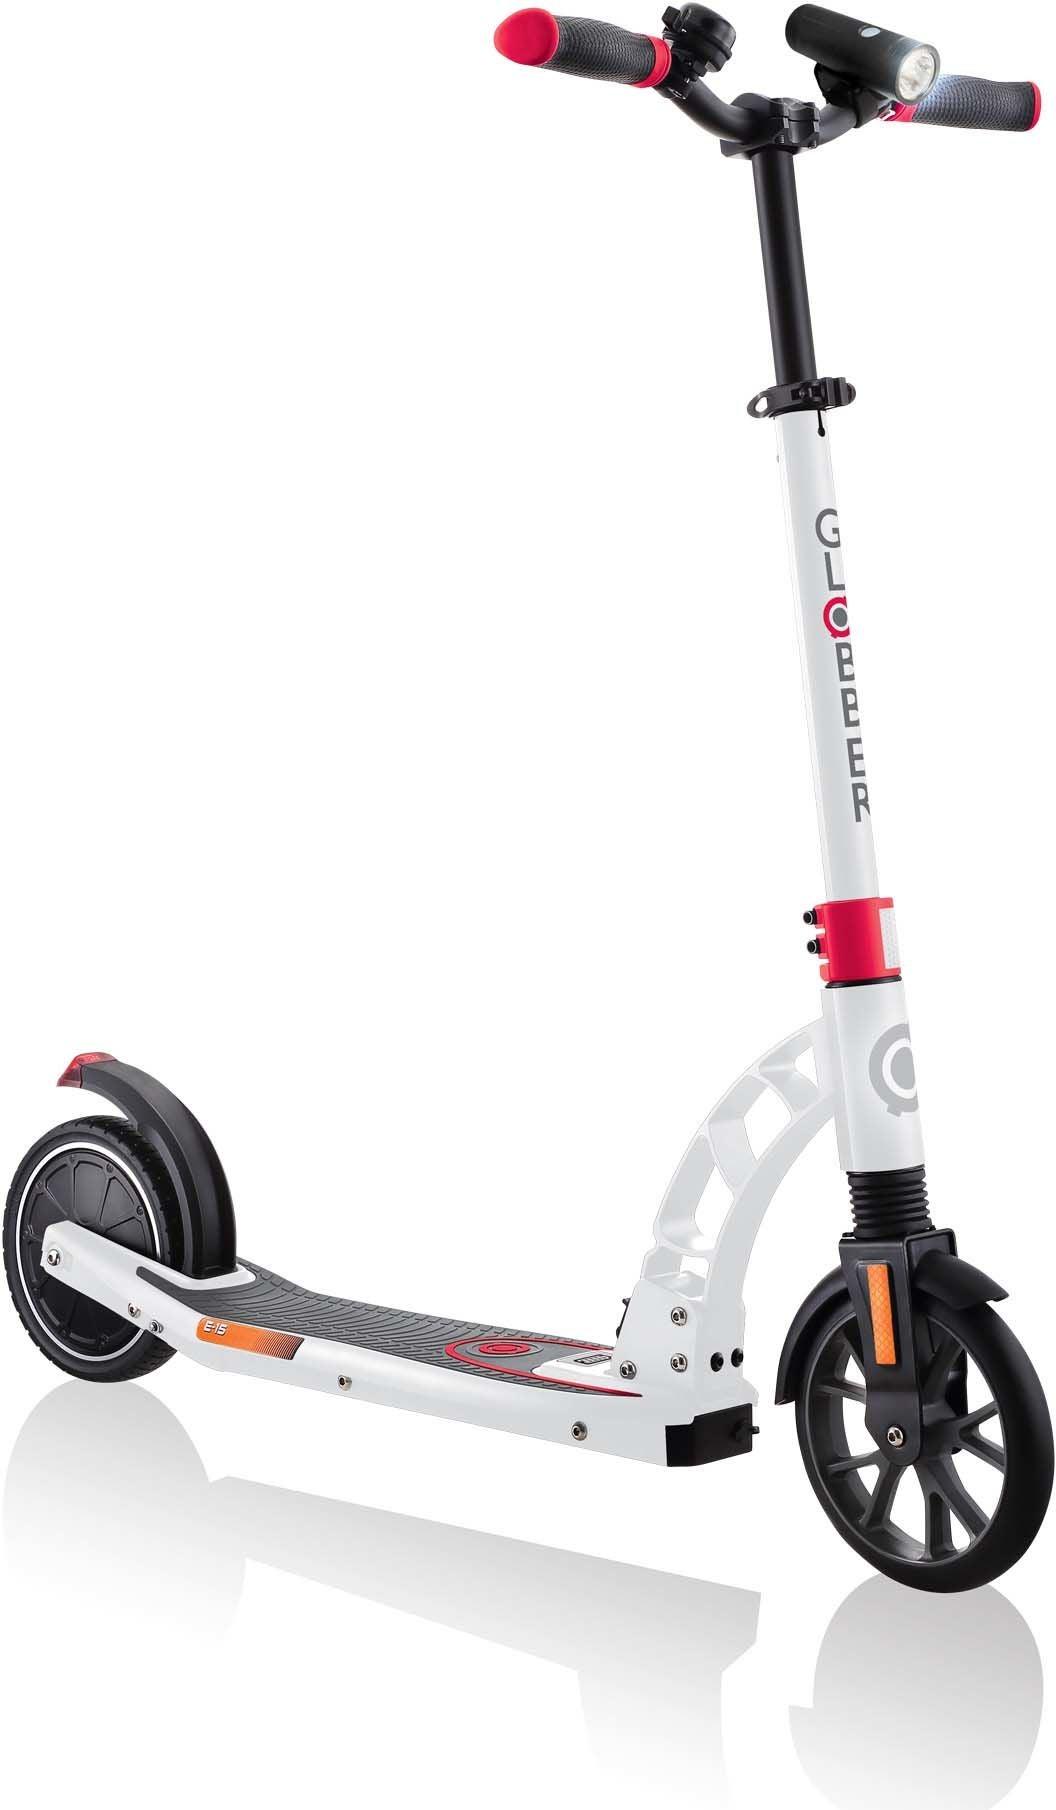 Globber E.Motion Elektrisk Sparkcykel, Vit/Röd